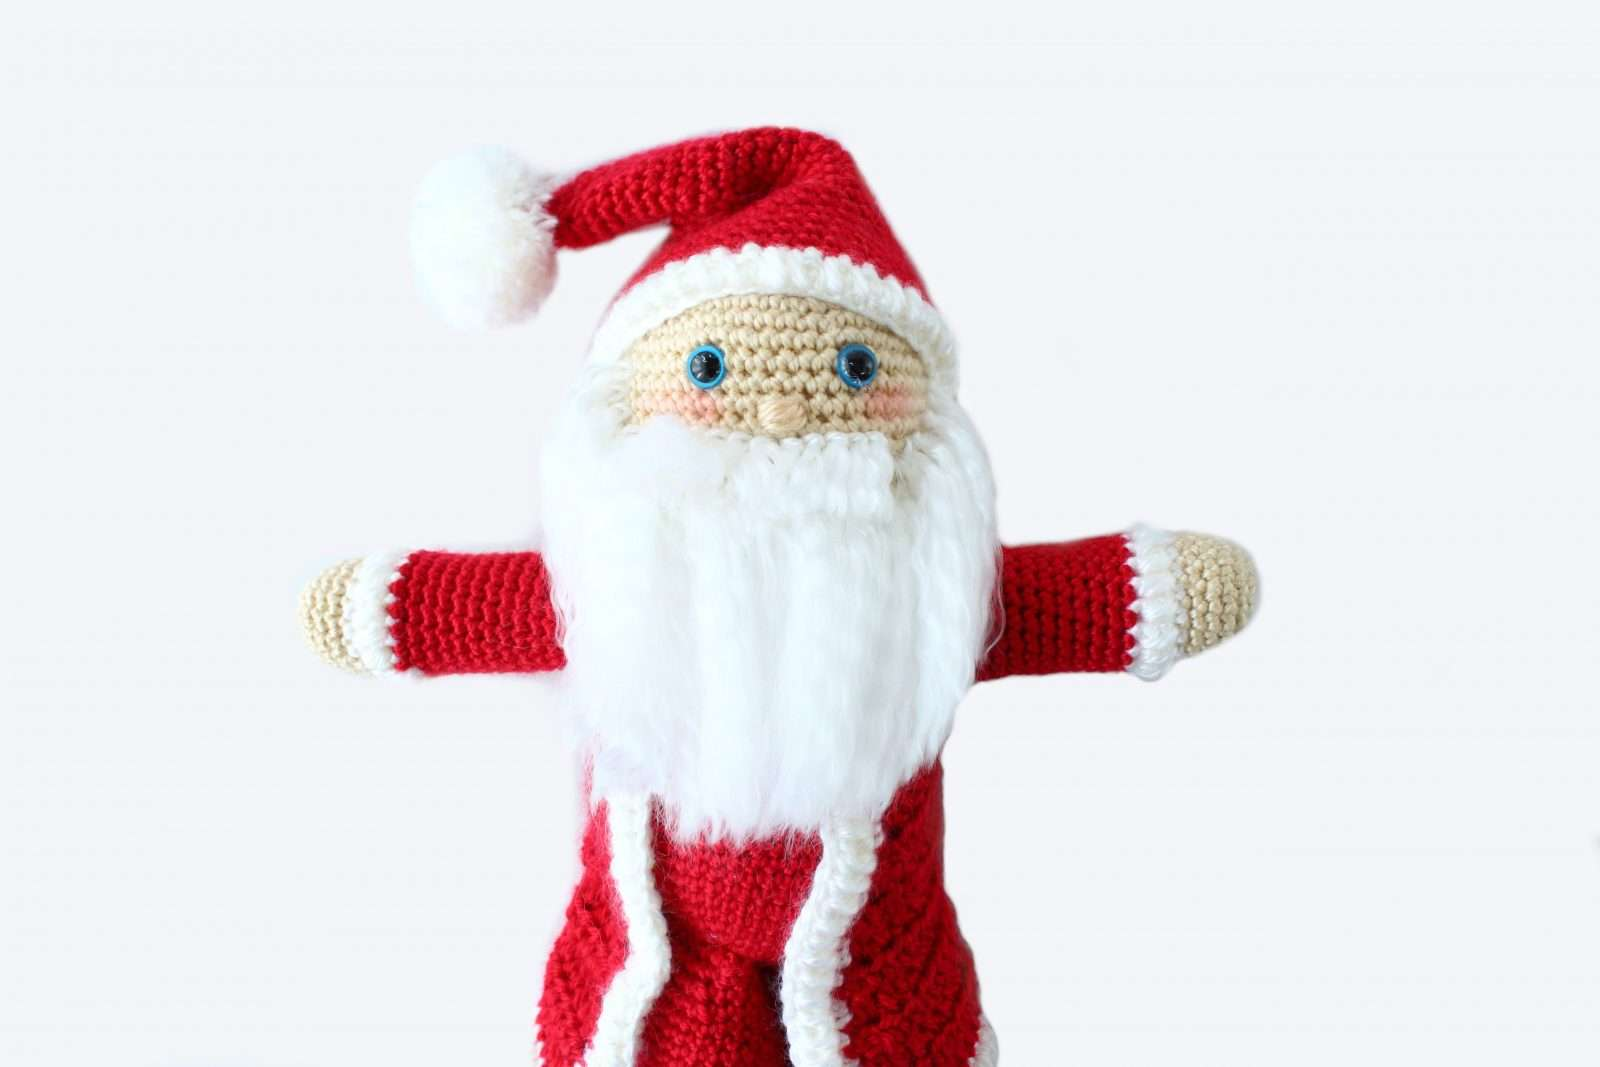 Crochet Santa Claus Plushie: Free Crochet Christmas Pattern